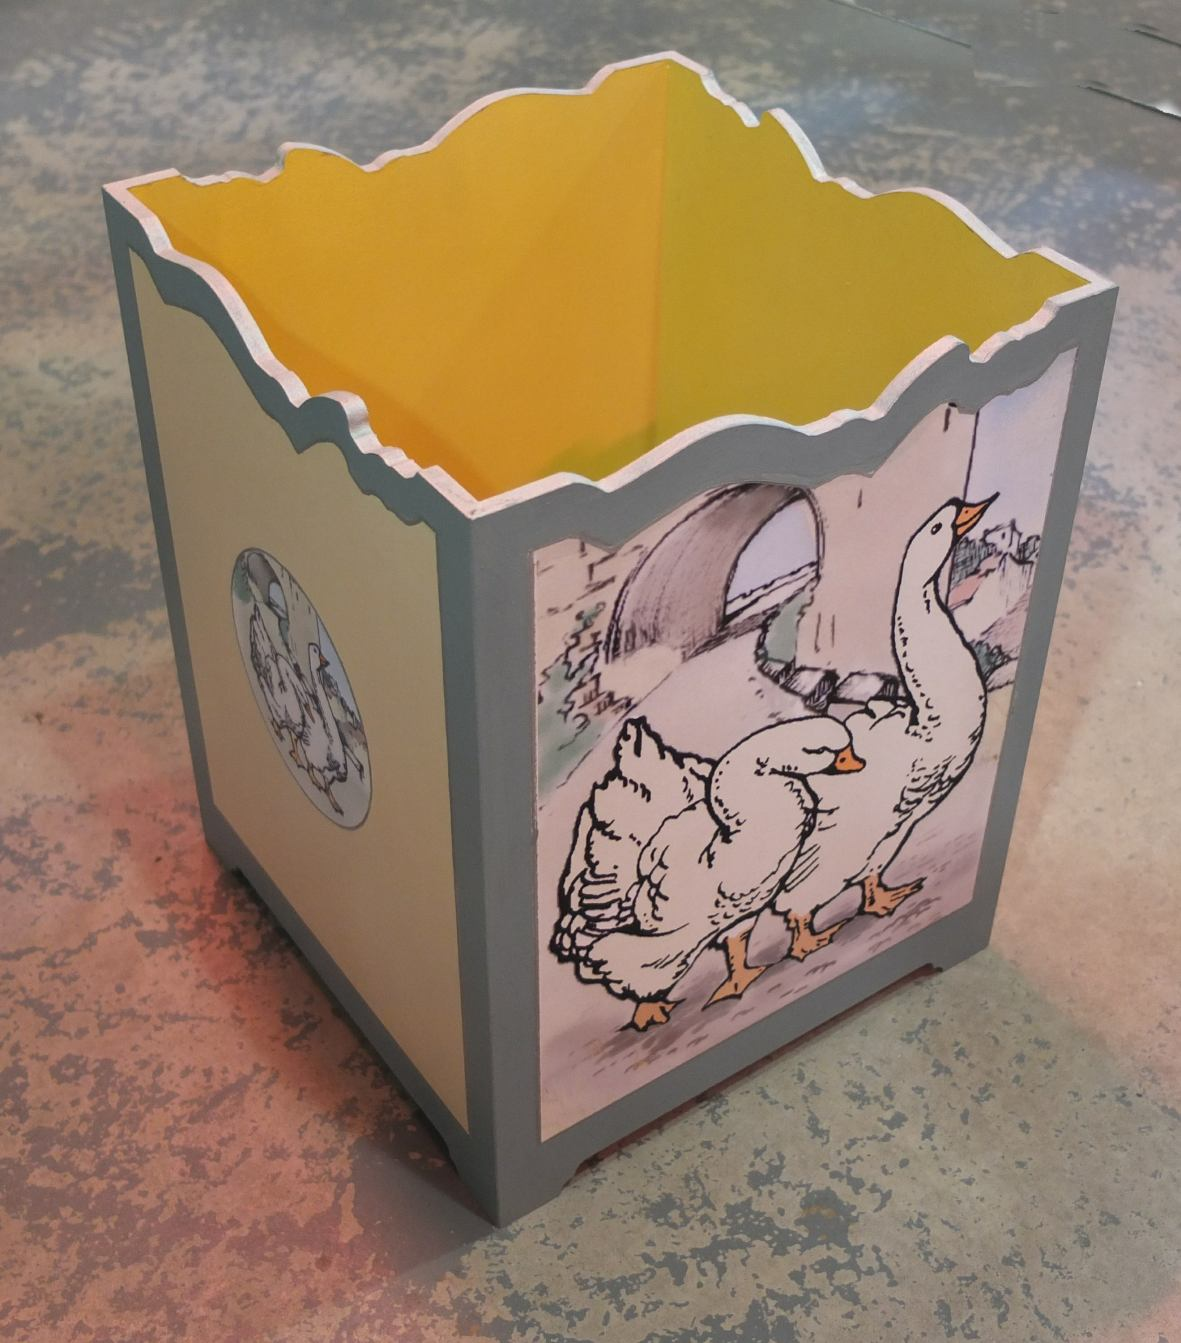 kate cochrane website - Geese waste paper bin.jpg